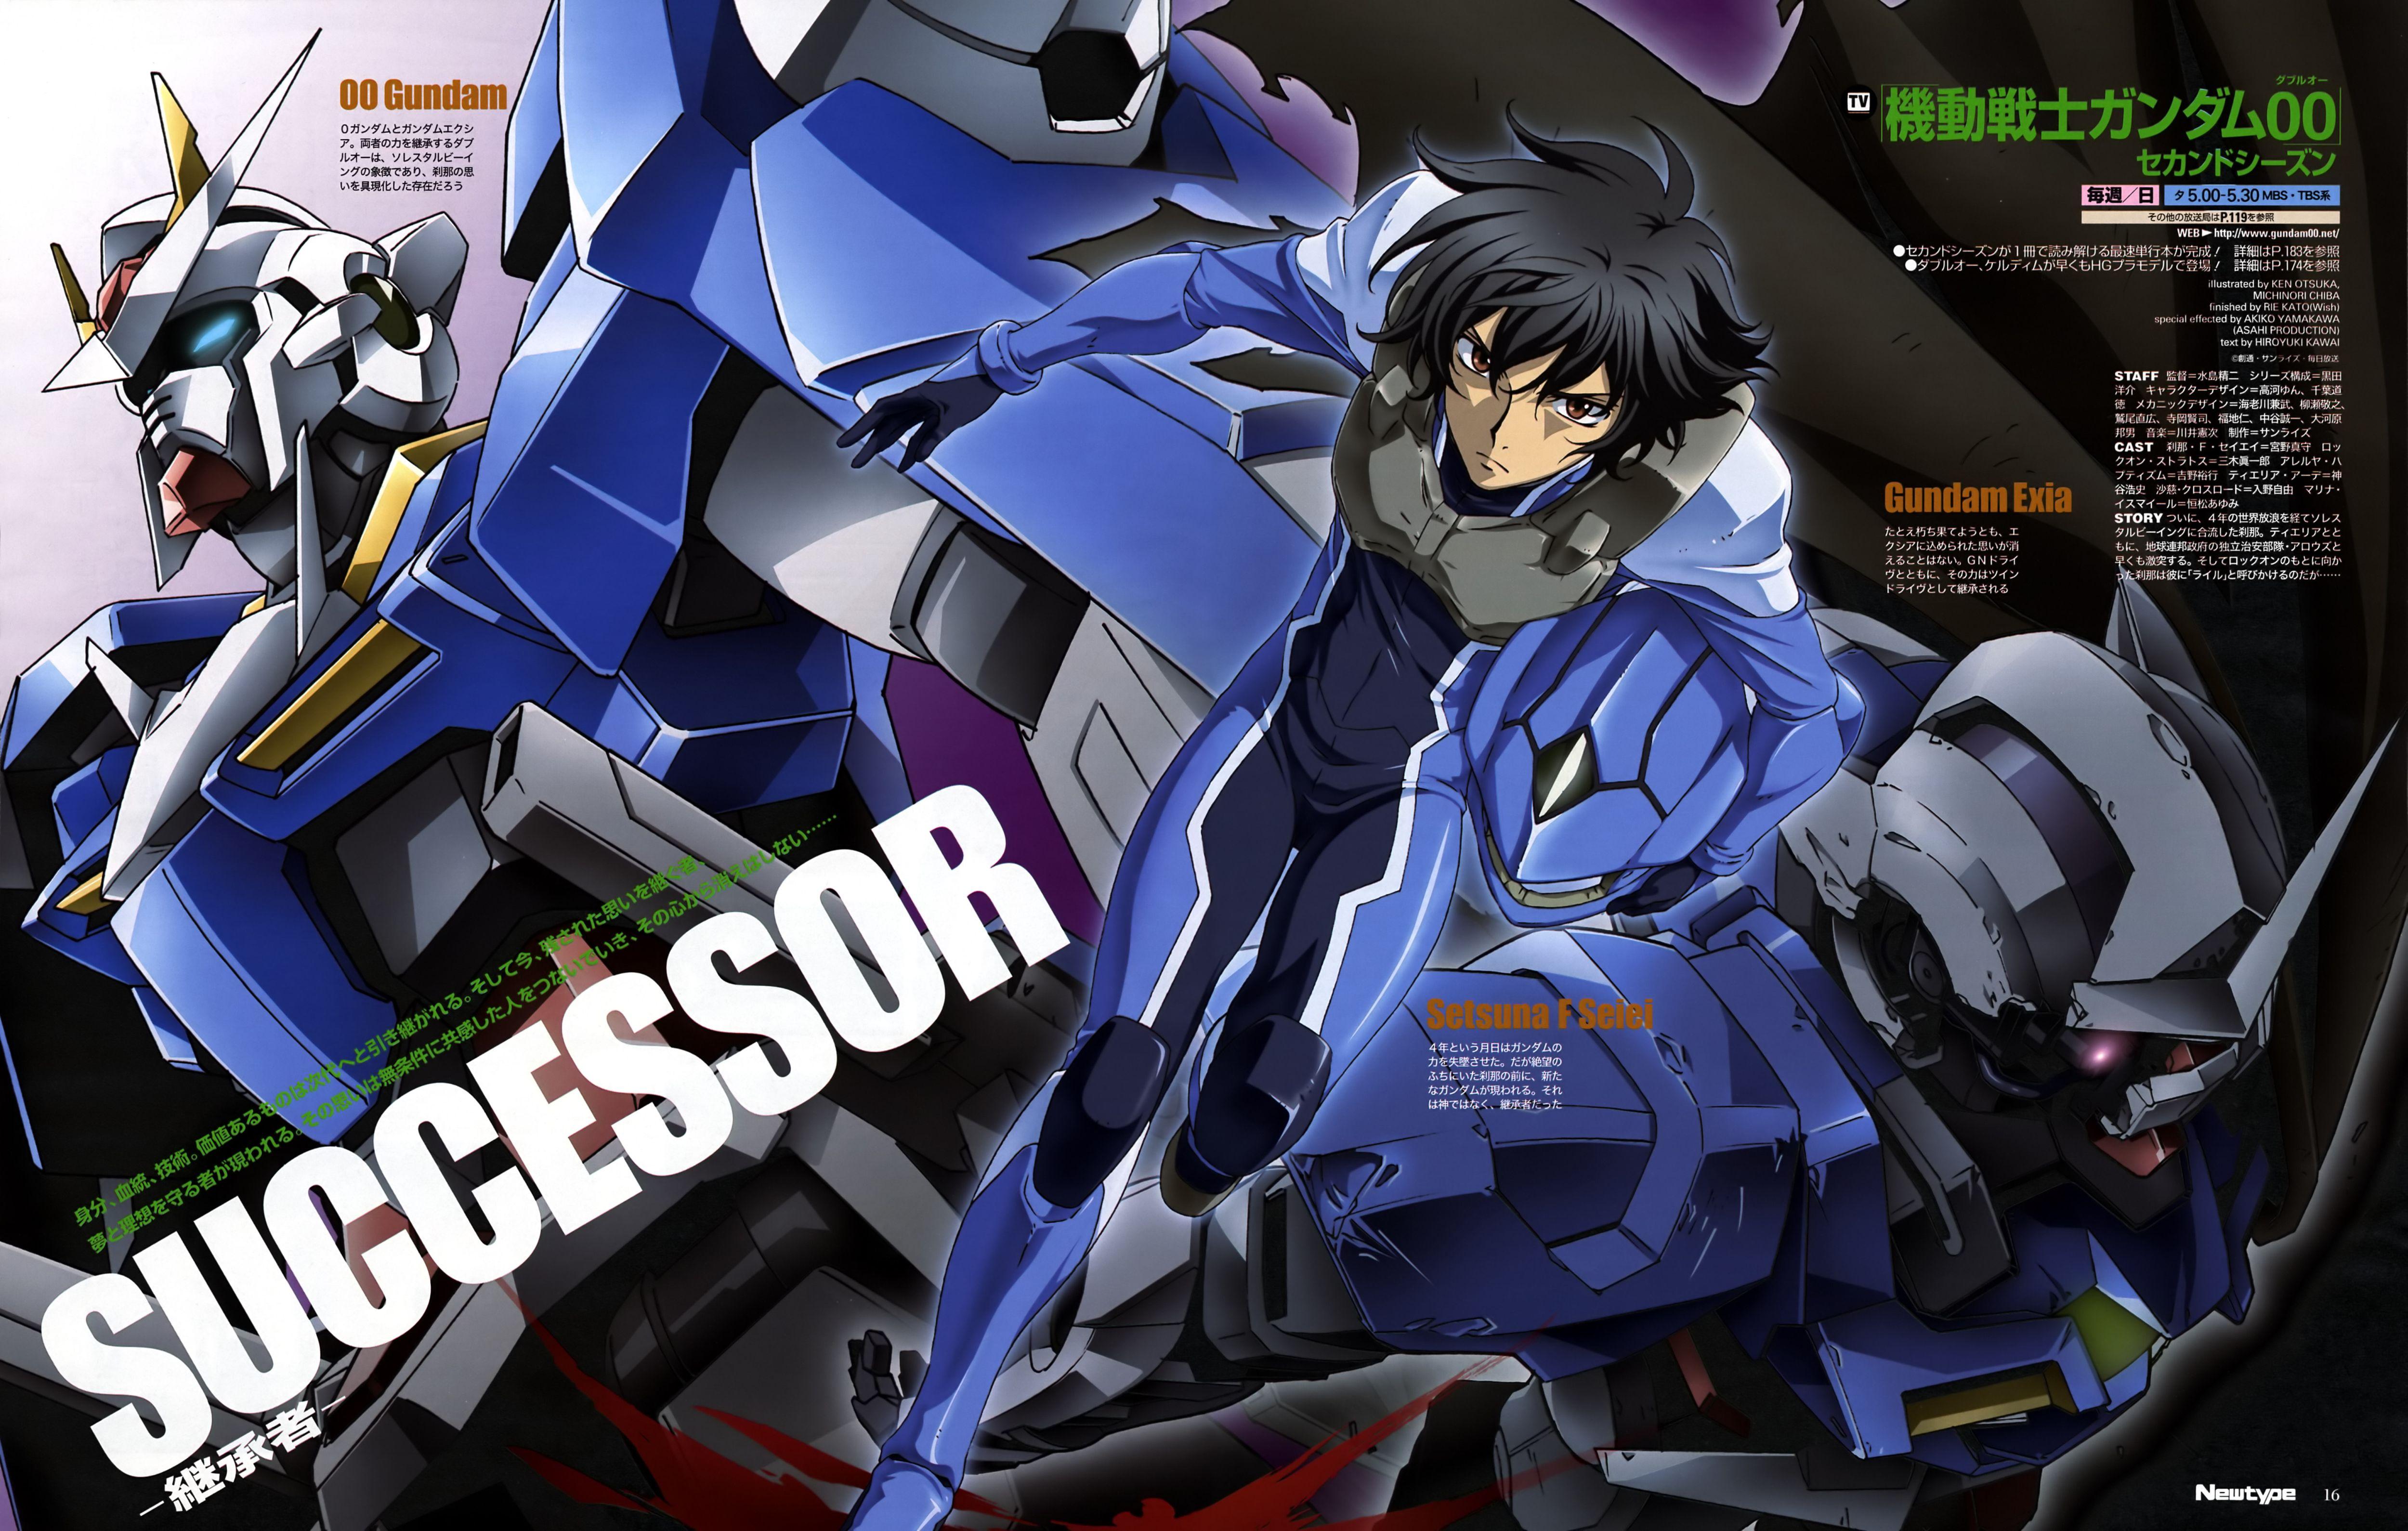 Setsuna F. Seiei - Mobile Suit Gundam 00 - Image #119135 ...